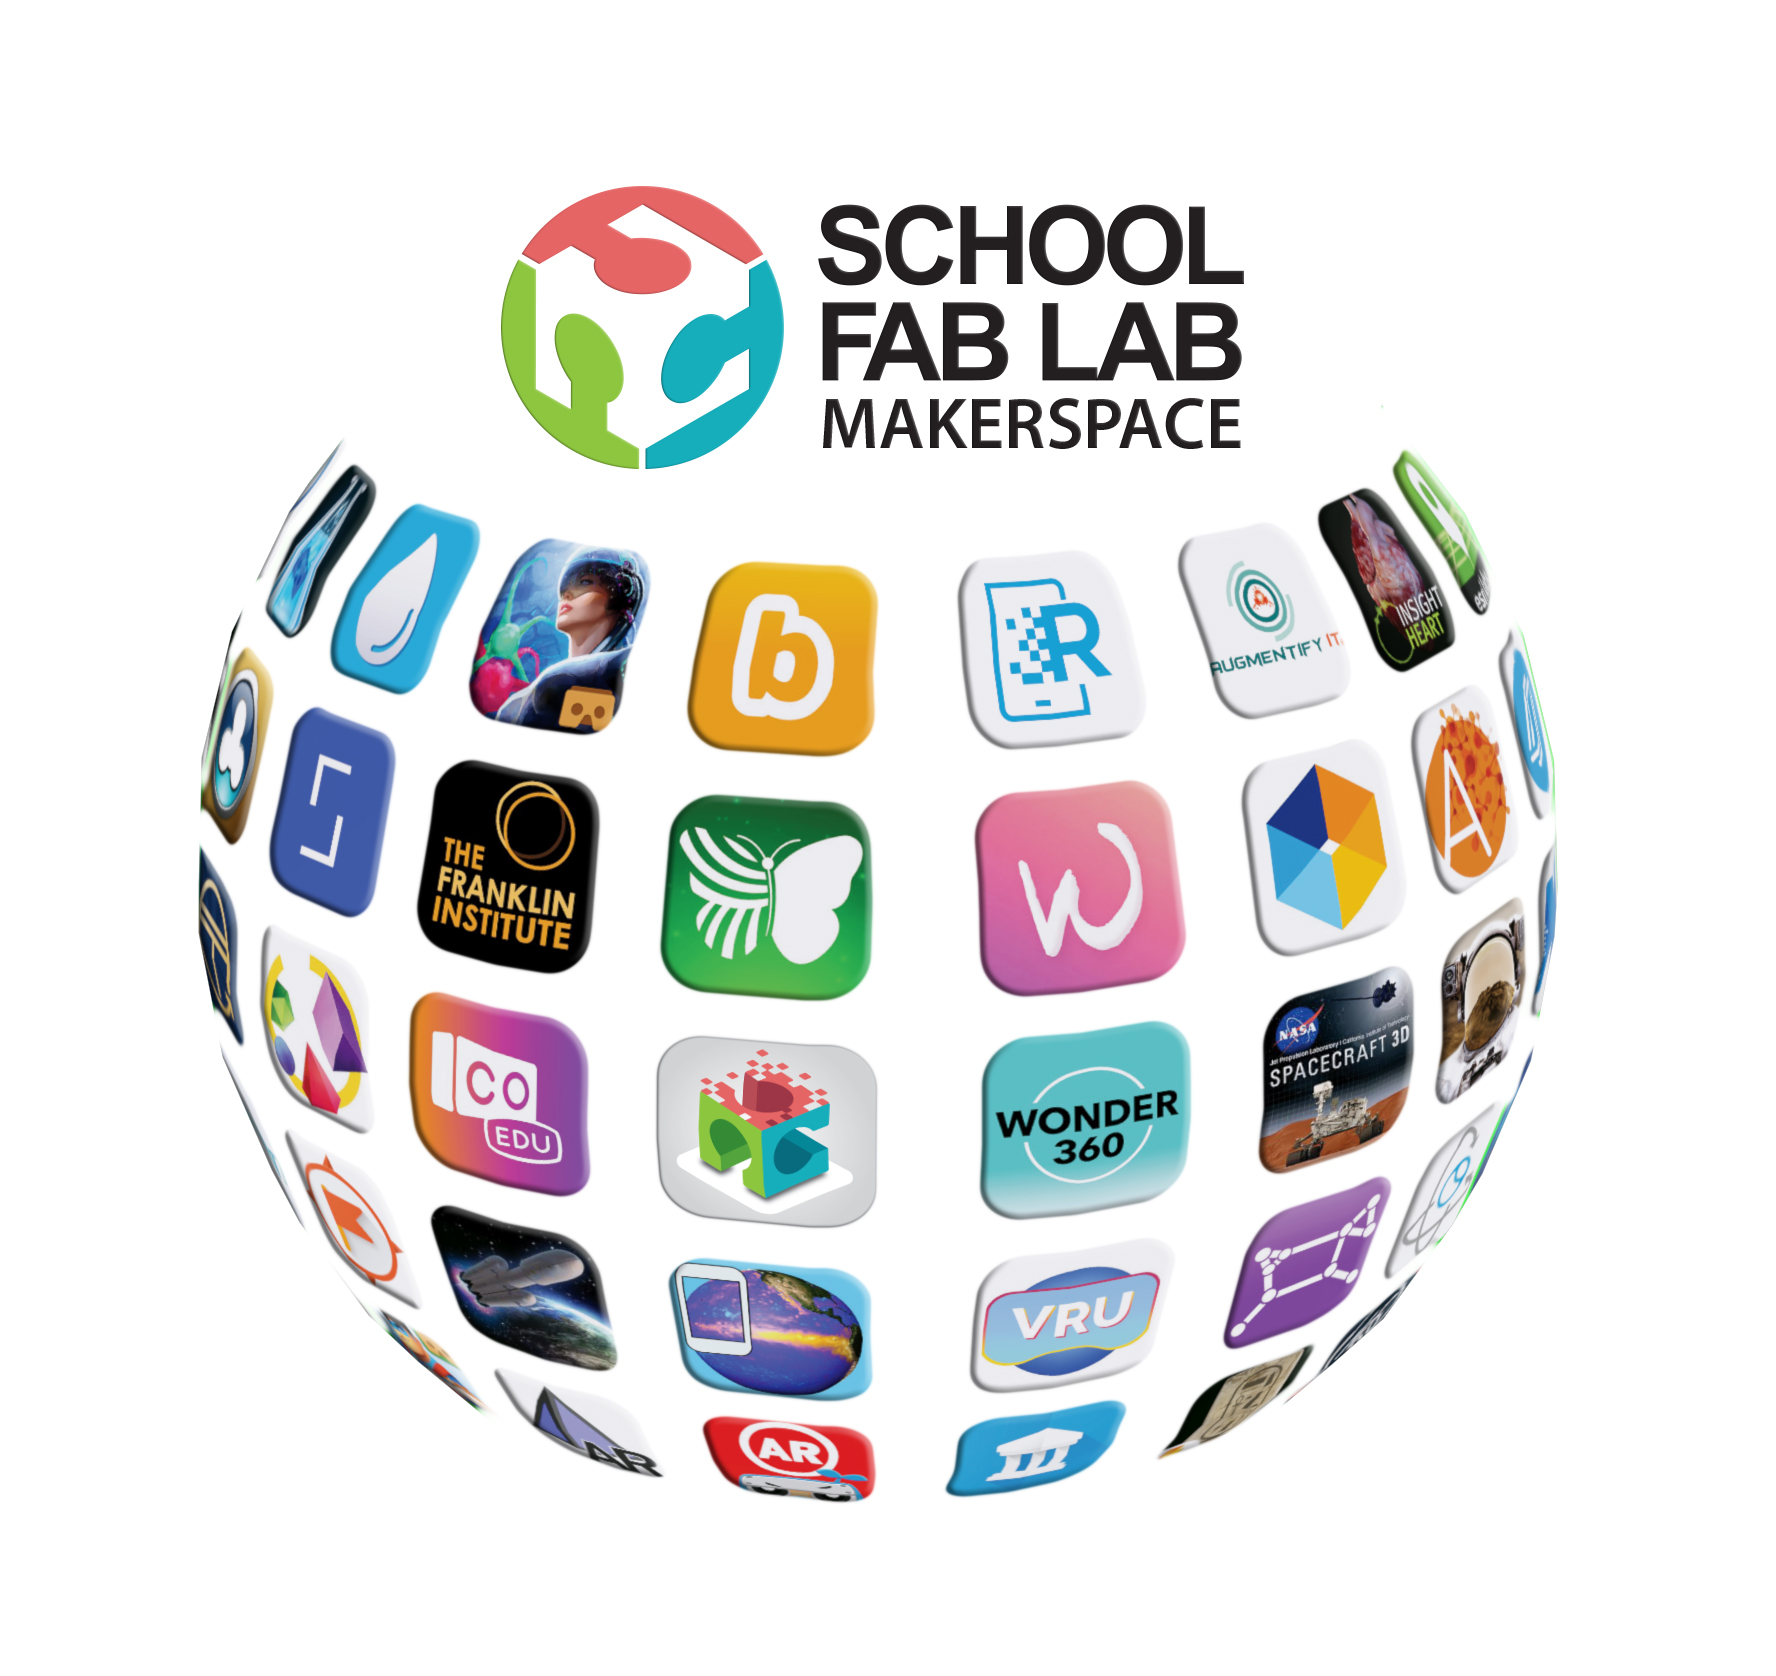 School Fab Lab List of AR and VR Education Apps!